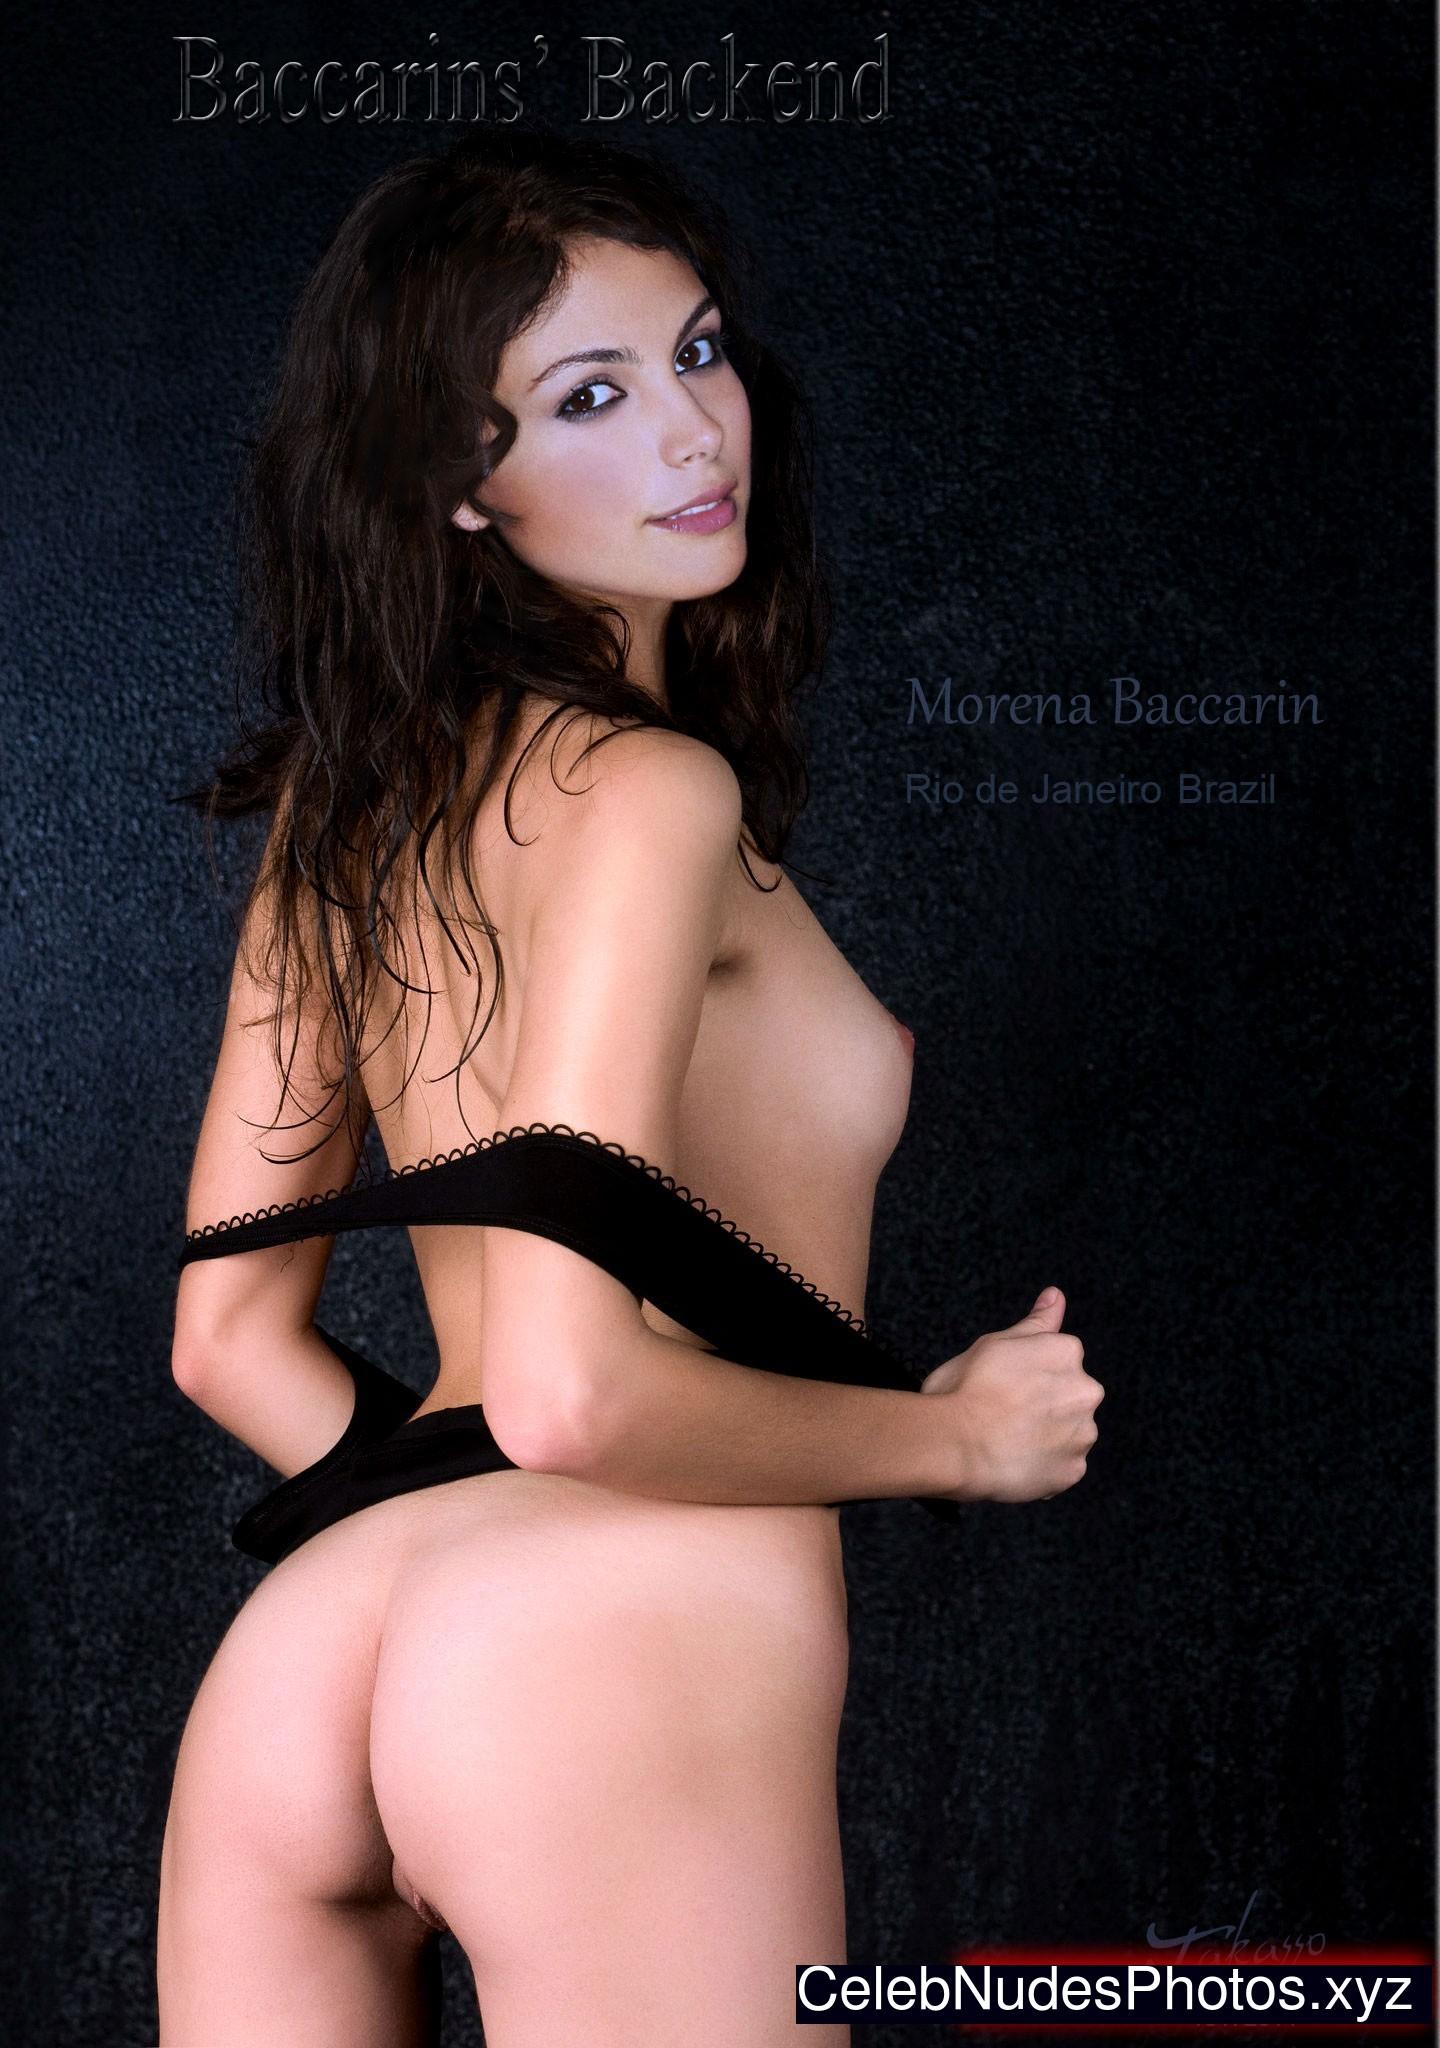 Morena Baccarin celeb nudes